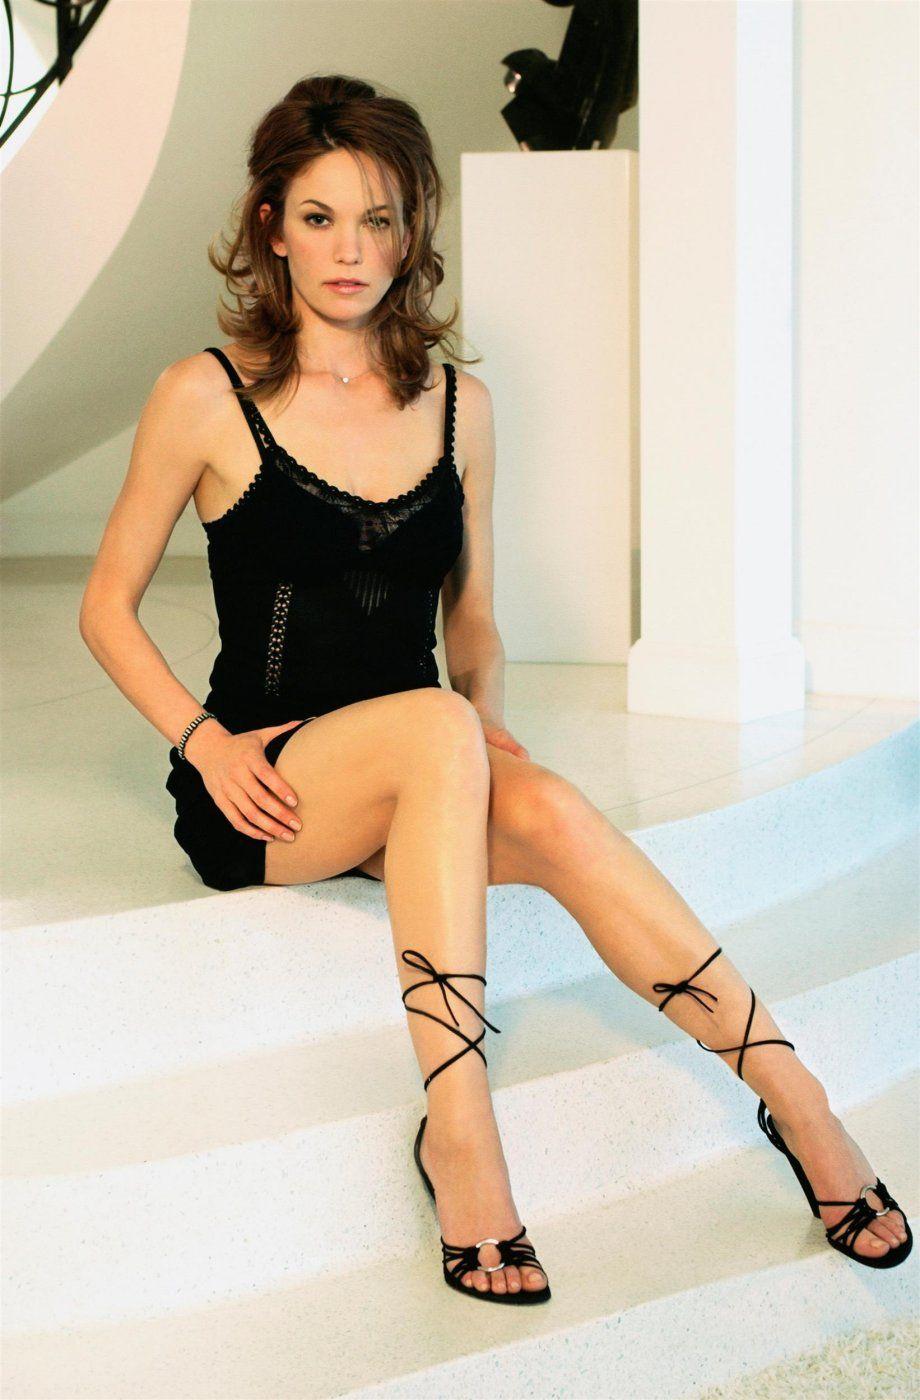 Diane Lane Nude Naked Picture Pic Photo Shoot Platinum Celebs Com